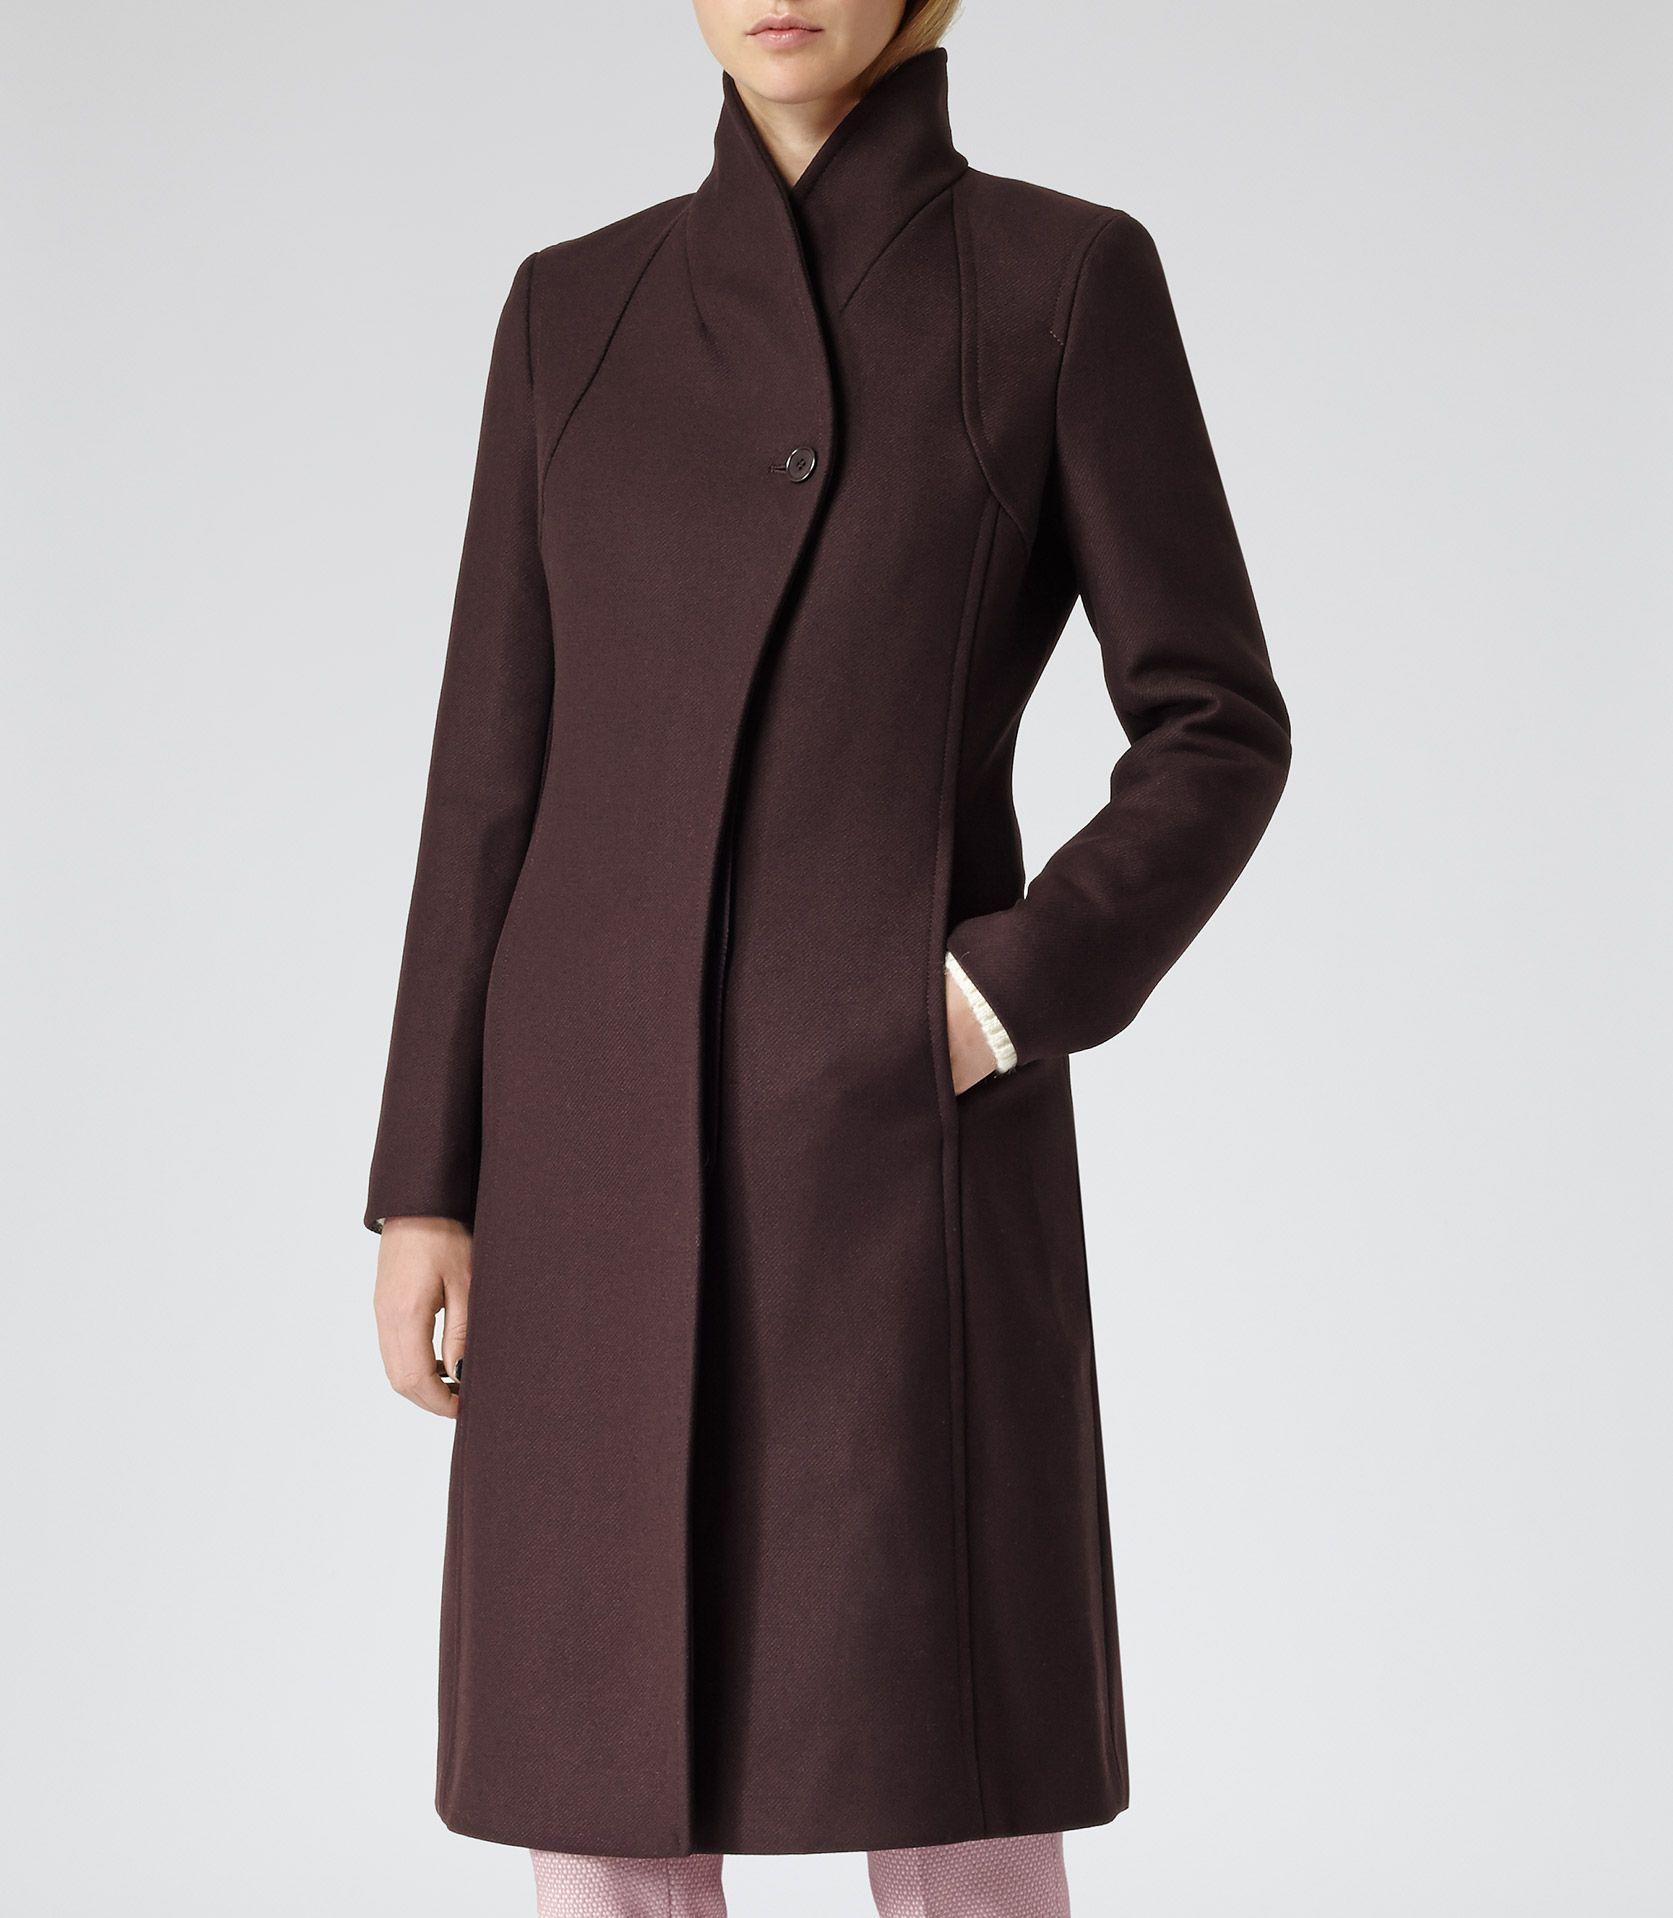 Womens work coat